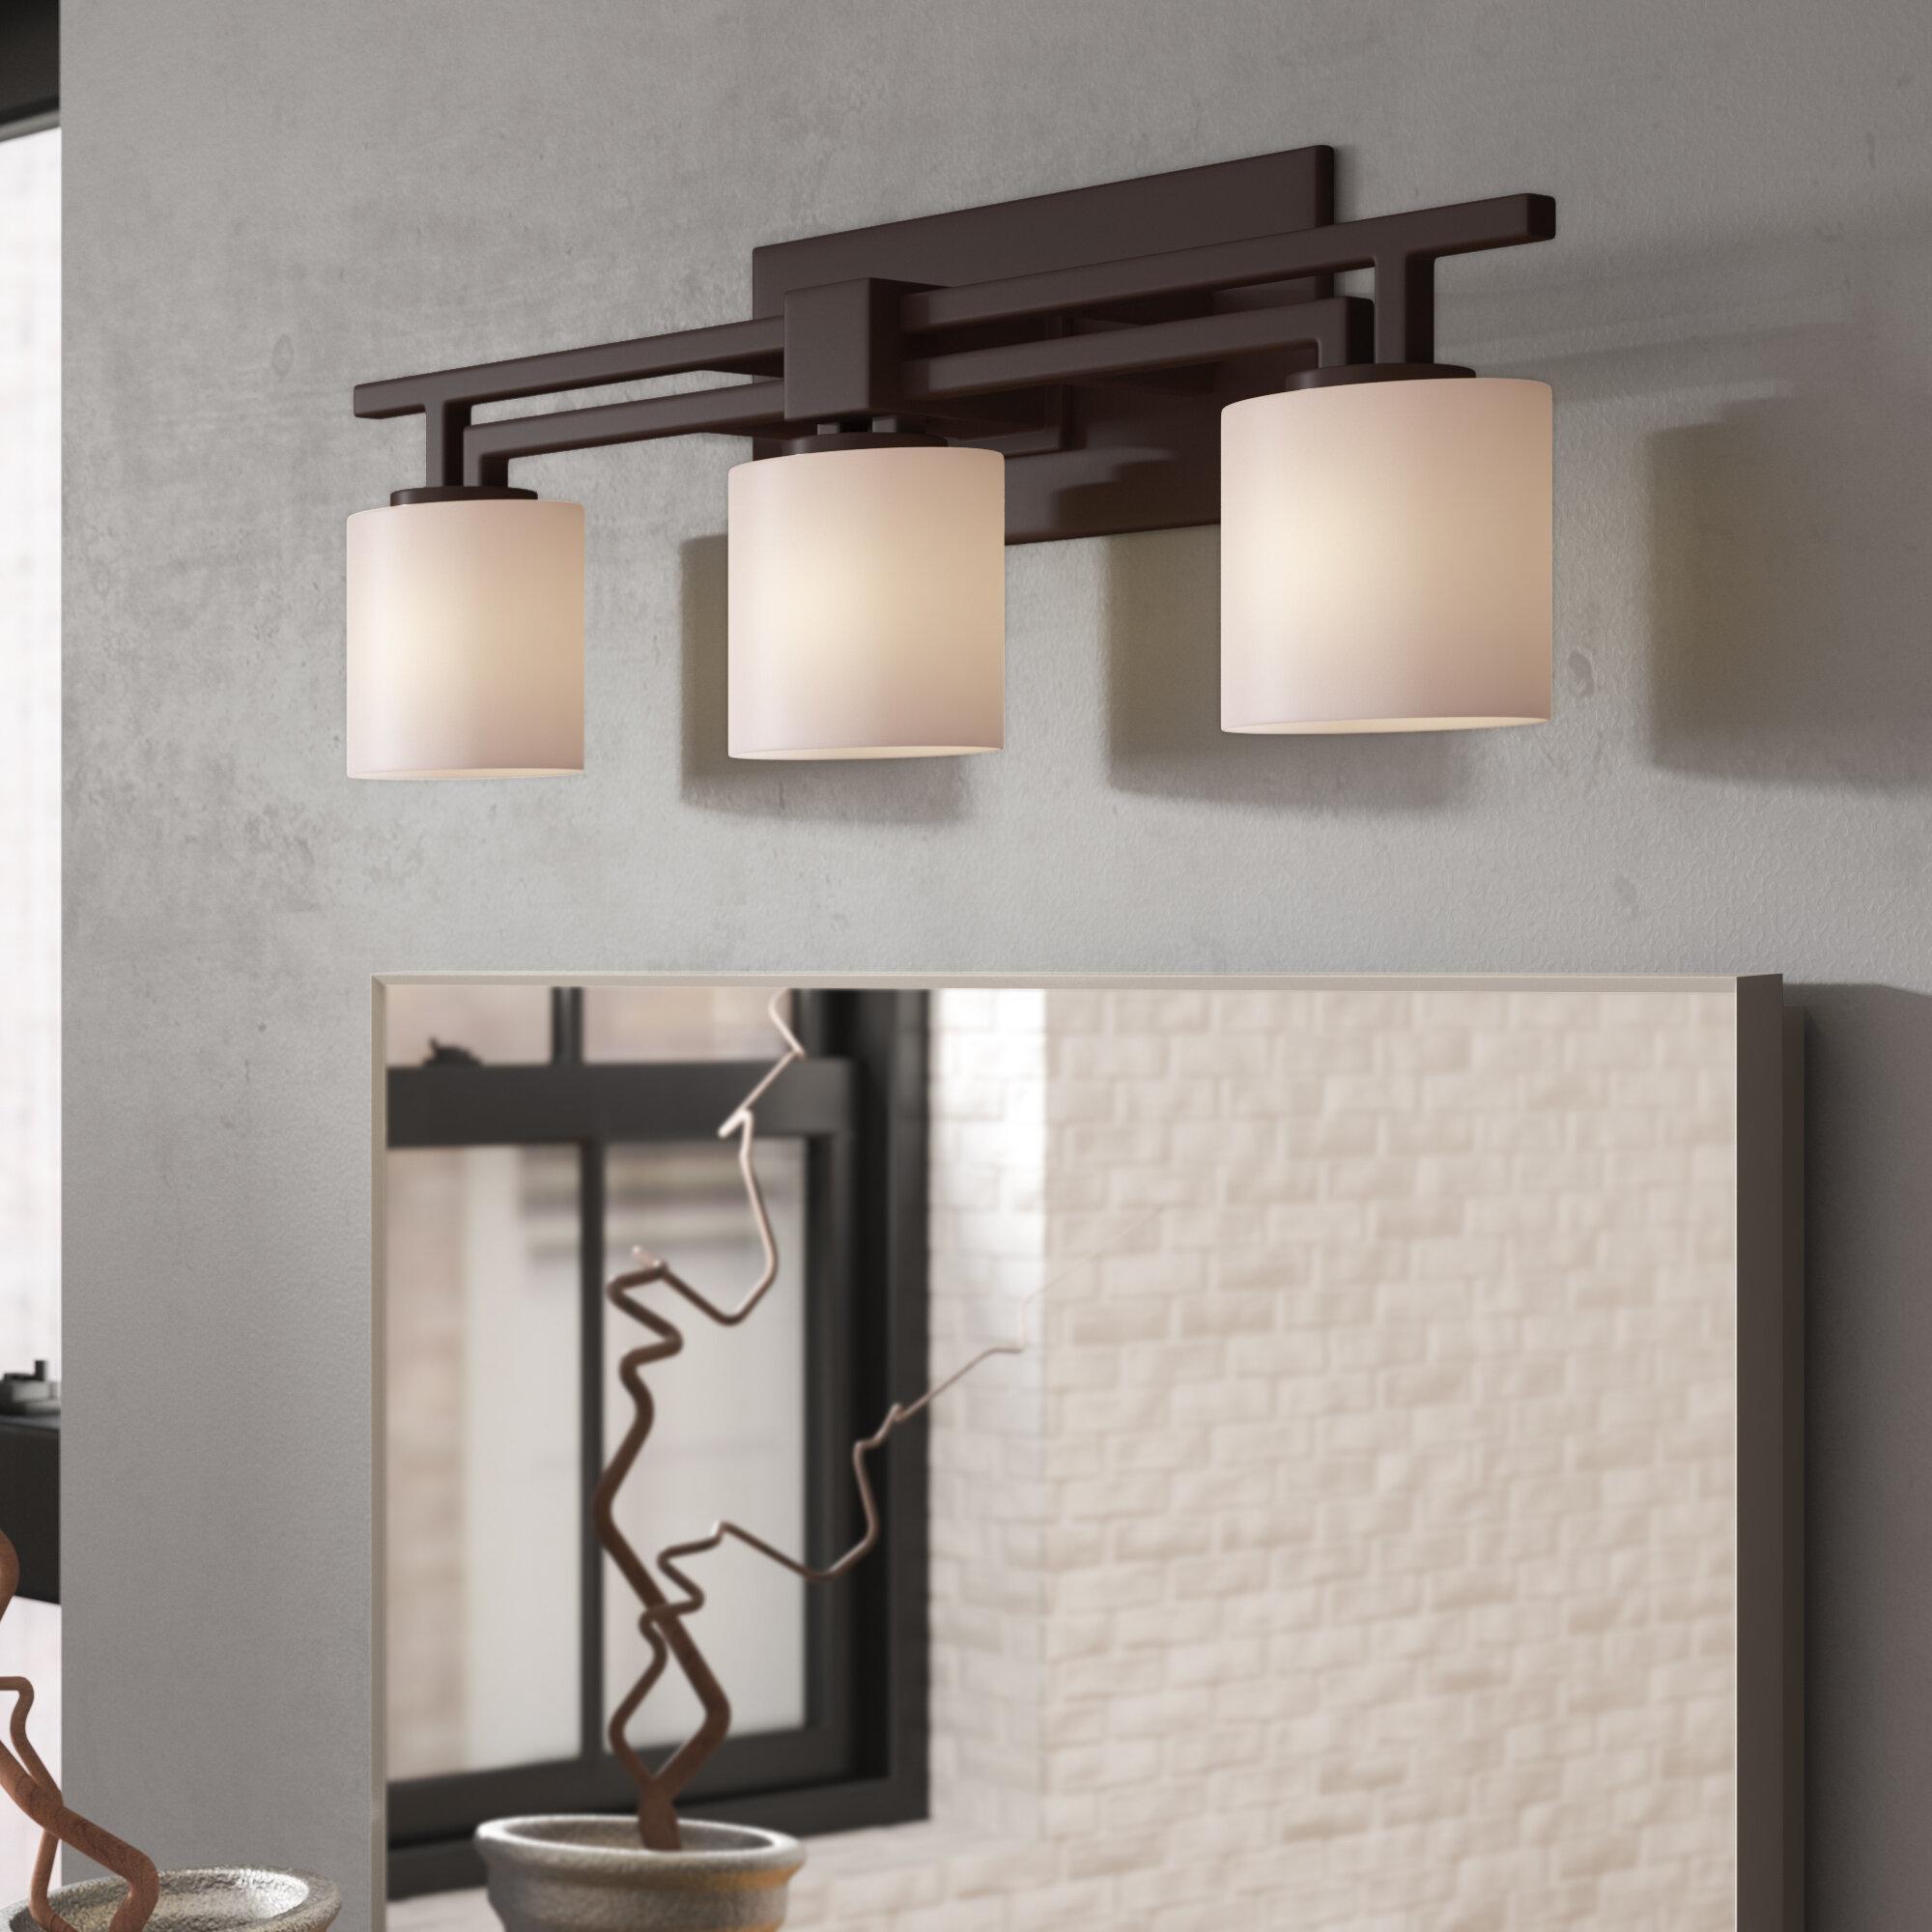 splendid fixtures lighting vanity bath light top lights mirrors plate bathroom idea unique cool plates ideas